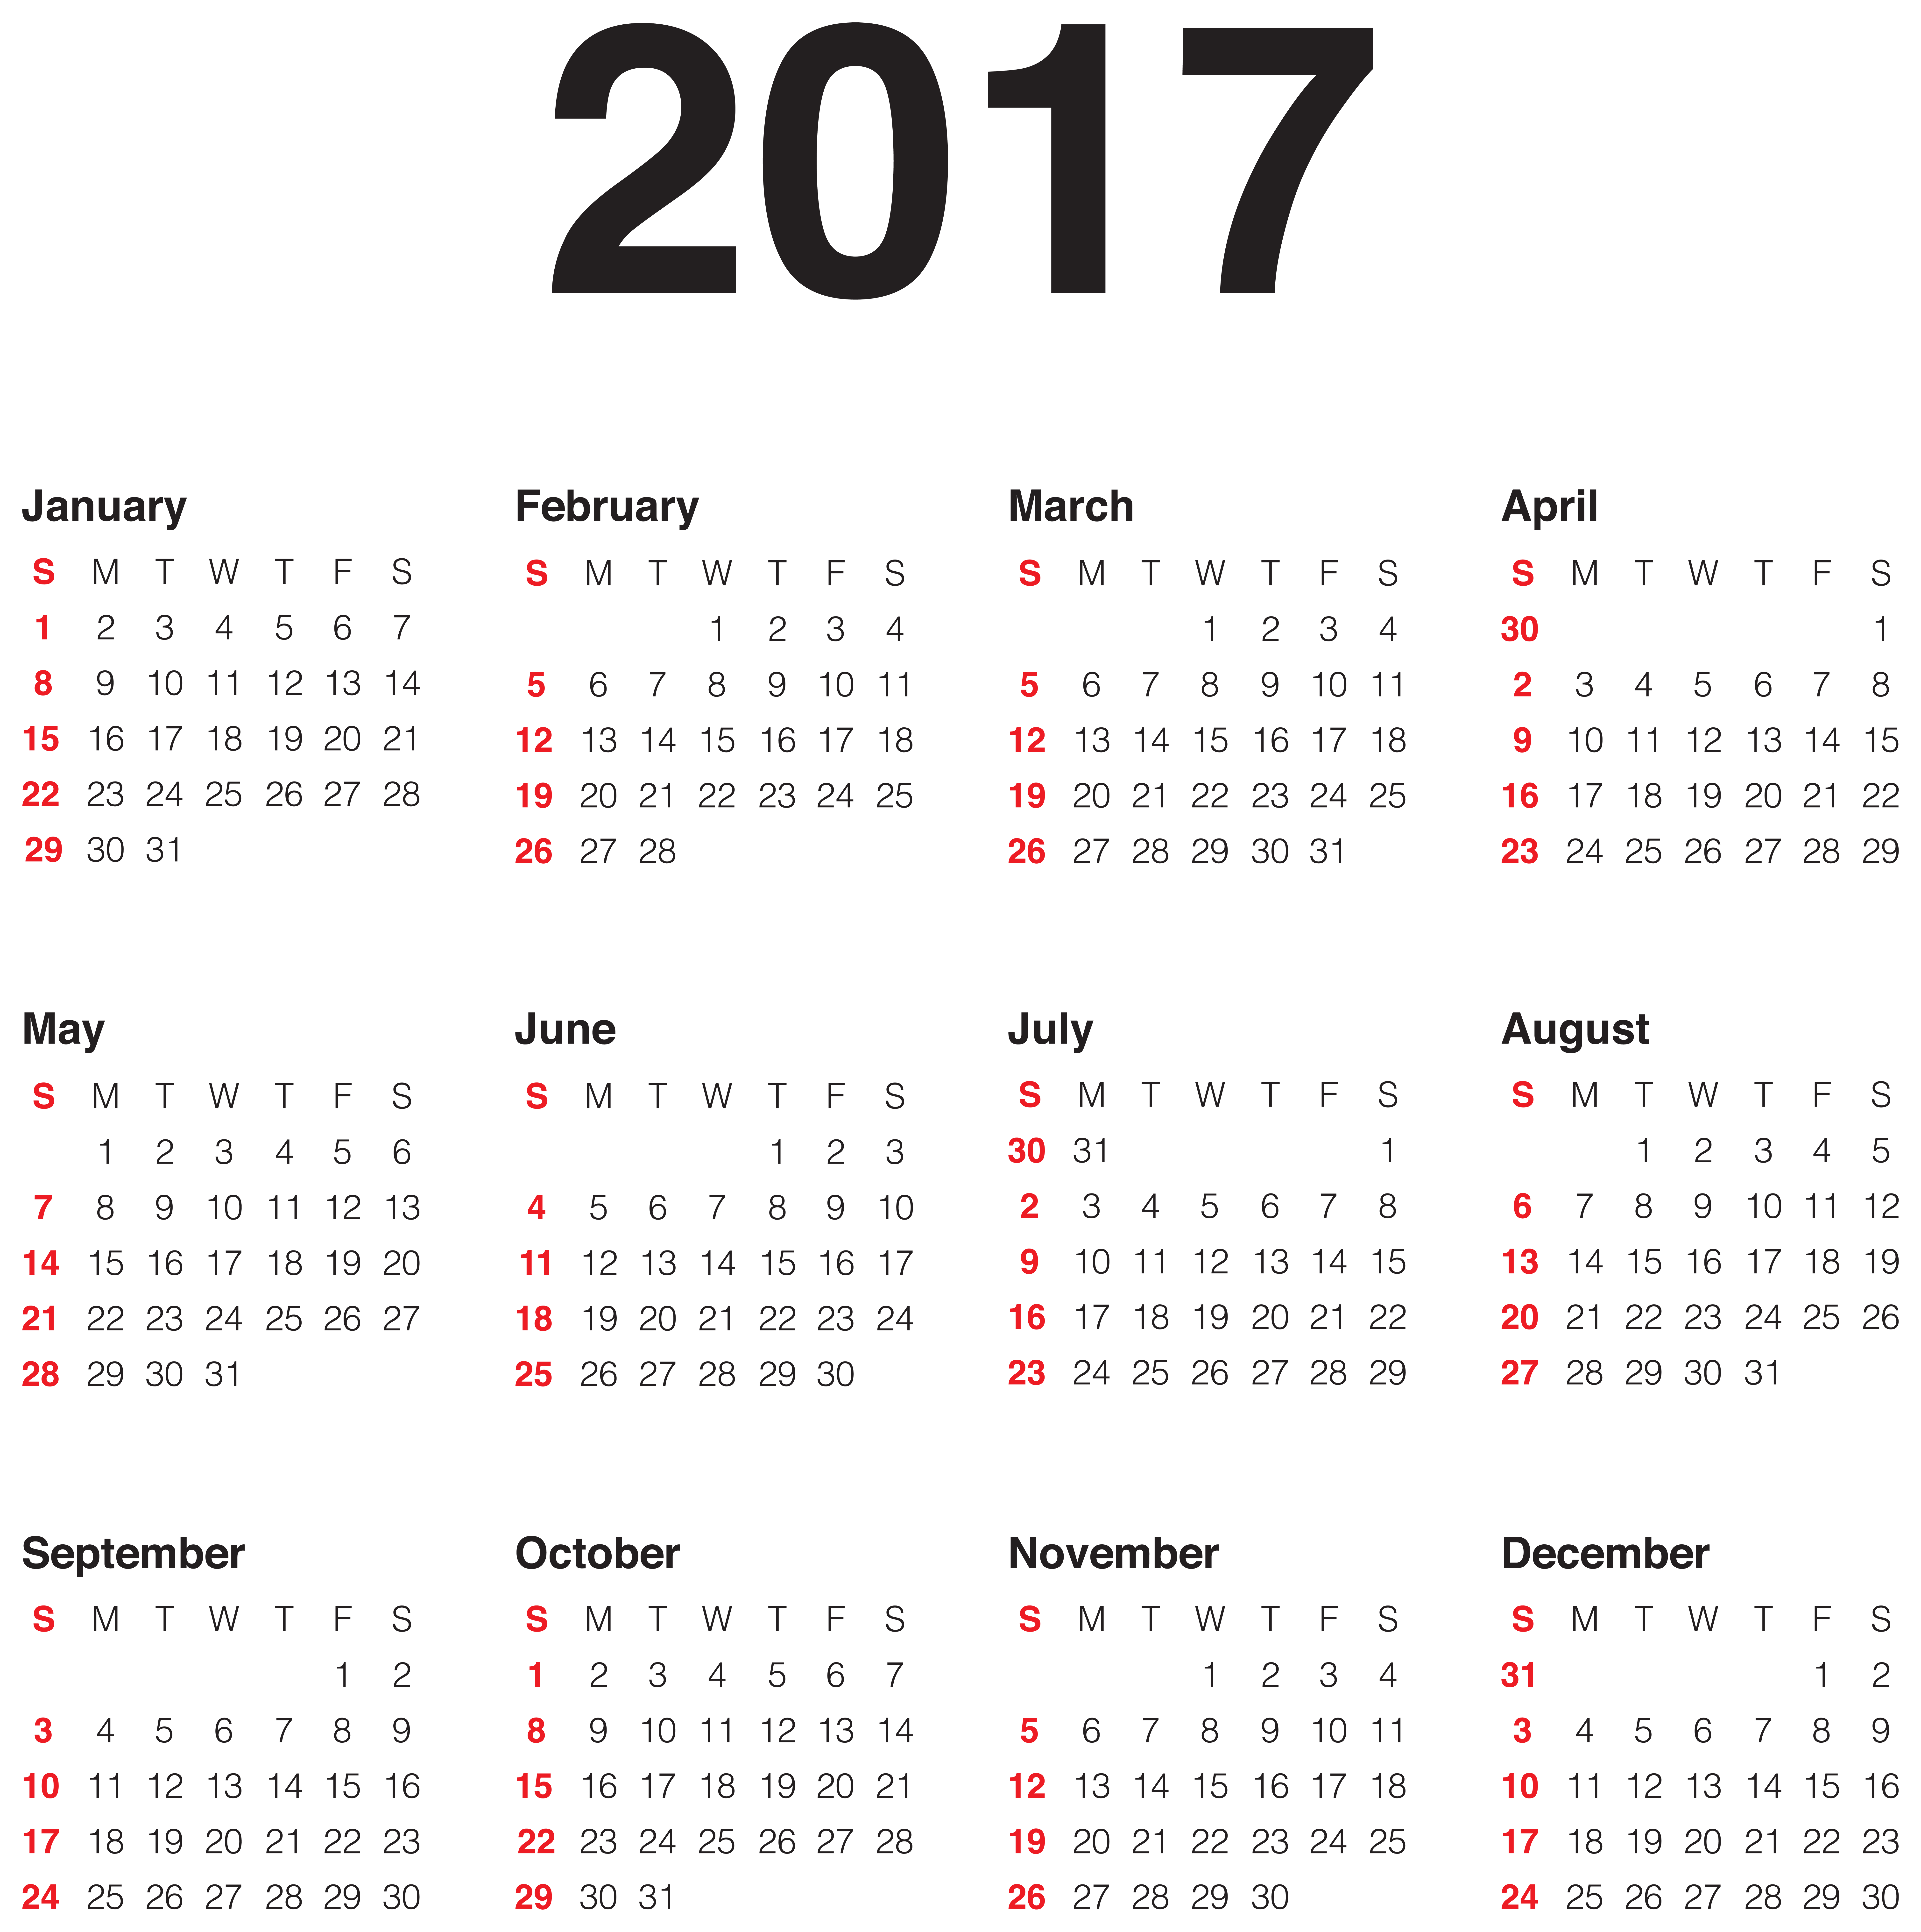 2017 Calendar Transparent PNG Clip Art Image.